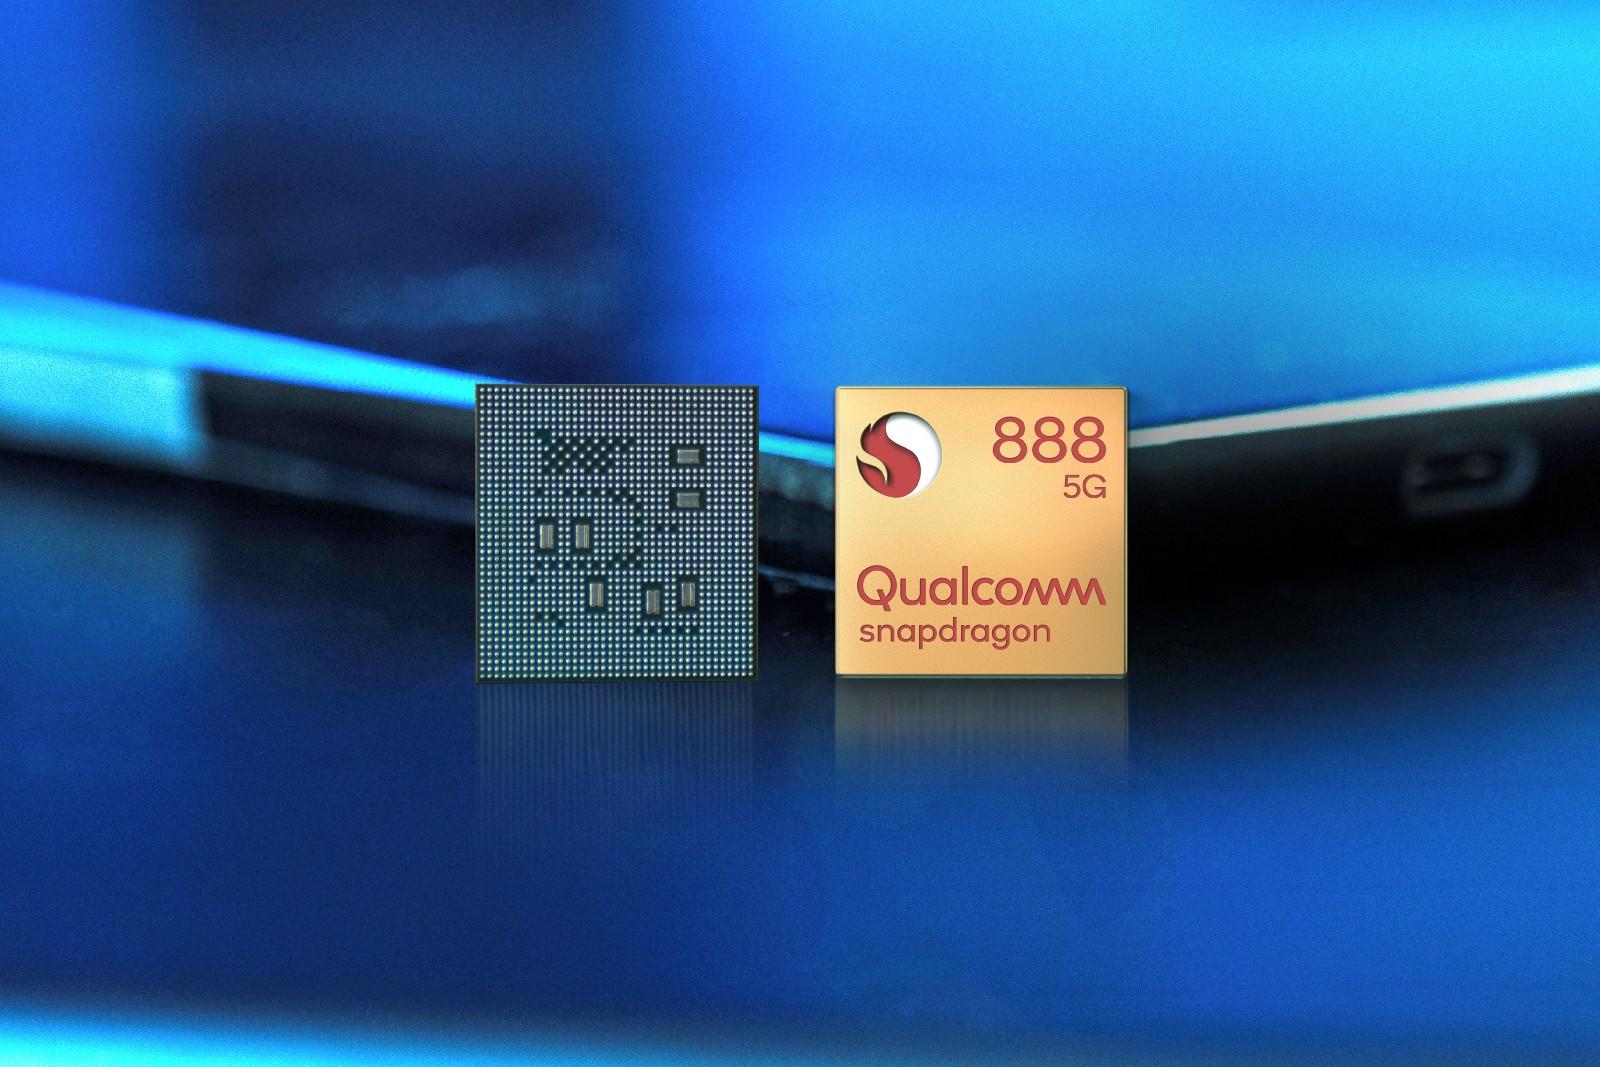 The Snapdragon 888 is Qualcomm's latest premium CPU for smartphones